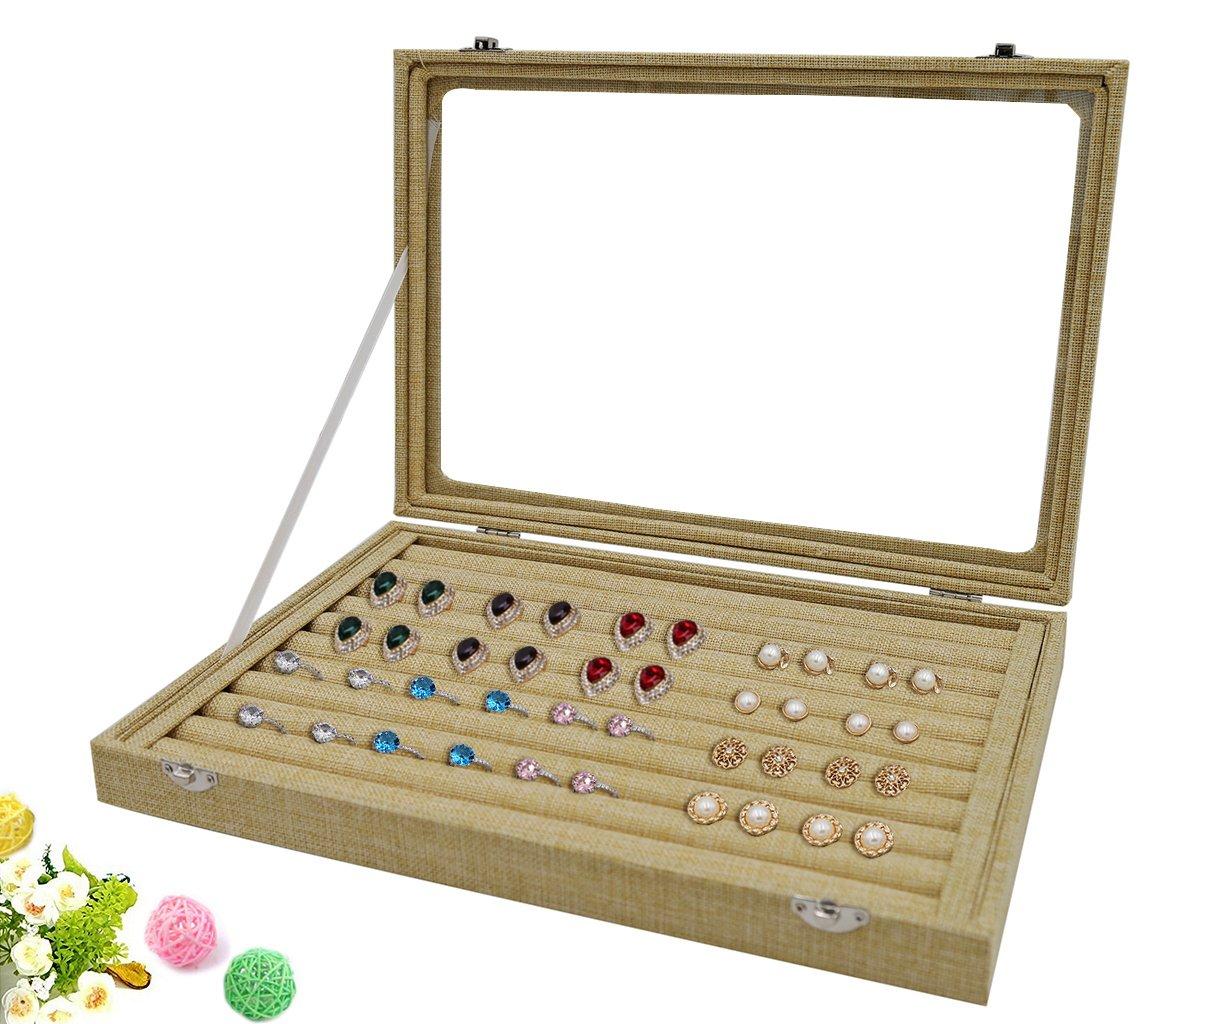 Wuligirl Clear Lid 7 Slots Jewelry Rings Earrings Tray Showcase Display Storage Box Case Organizer Burlap Linen